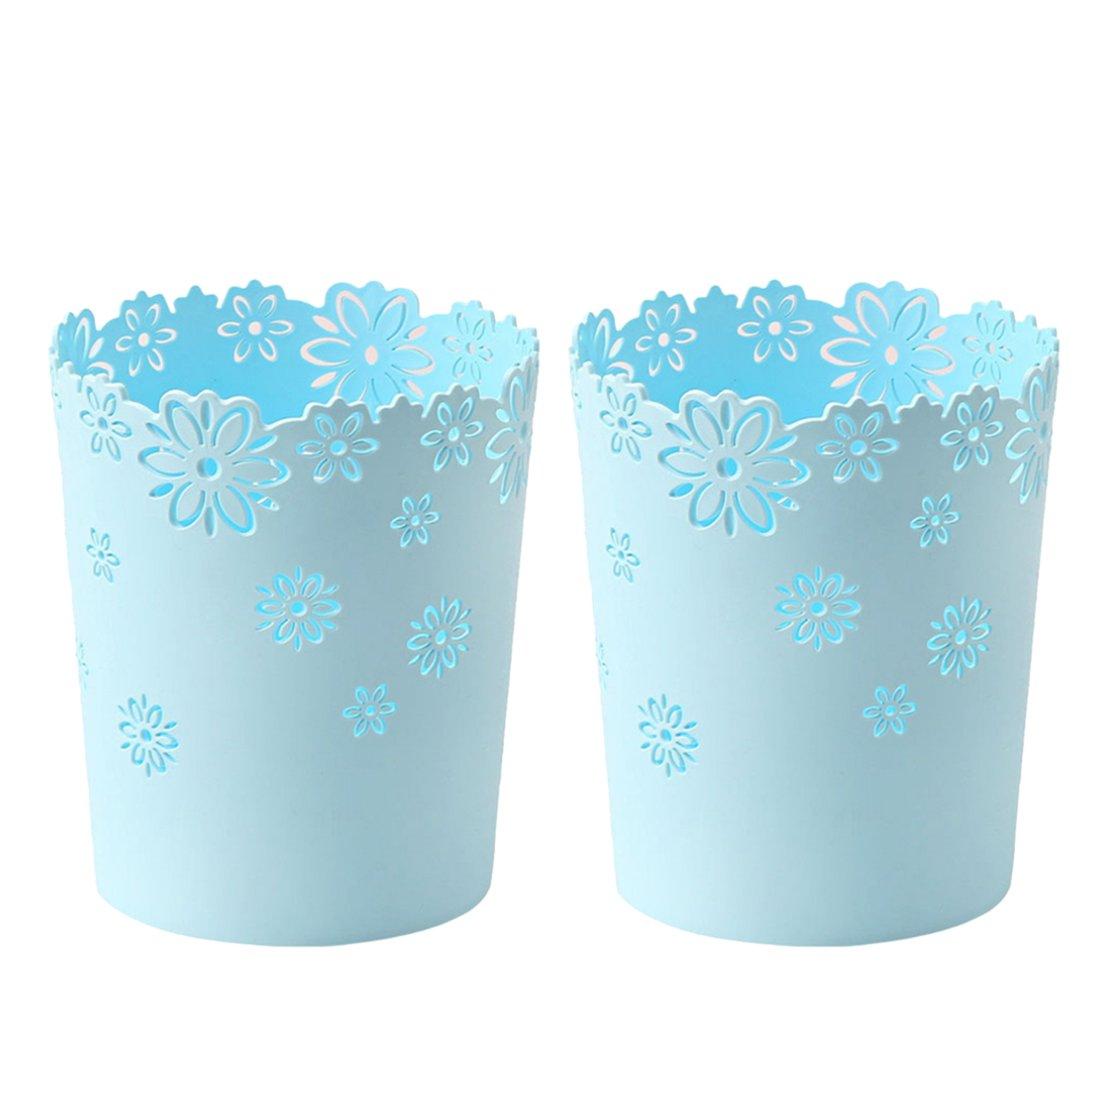 Papierkorb Büro, Foxom 2 Stück Kunststoff Blumen Höhle Abfalleimer Mülleimer Mülltonne Papierkorb für Büro/Badezimmer/küche/Schlafzimmer (Blau) Papierkorb Büro